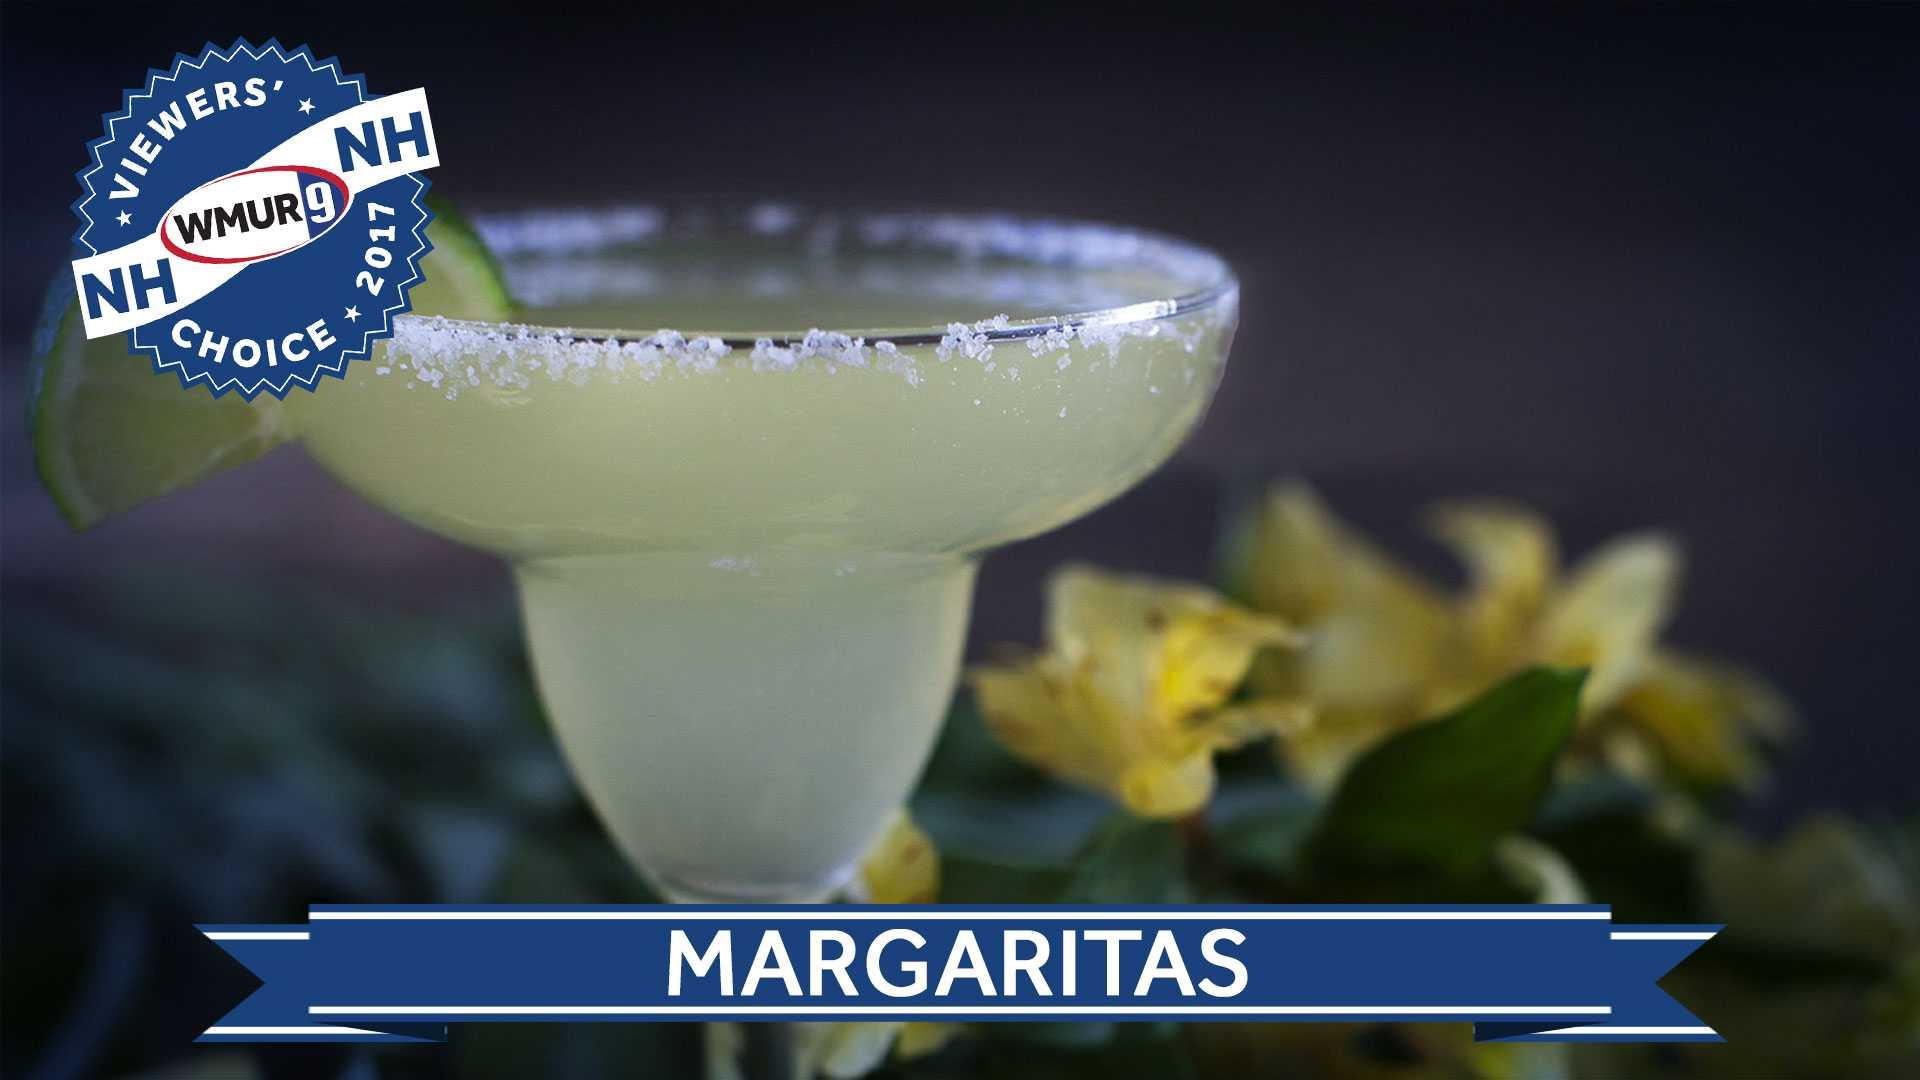 Viewers' Choice margaritas